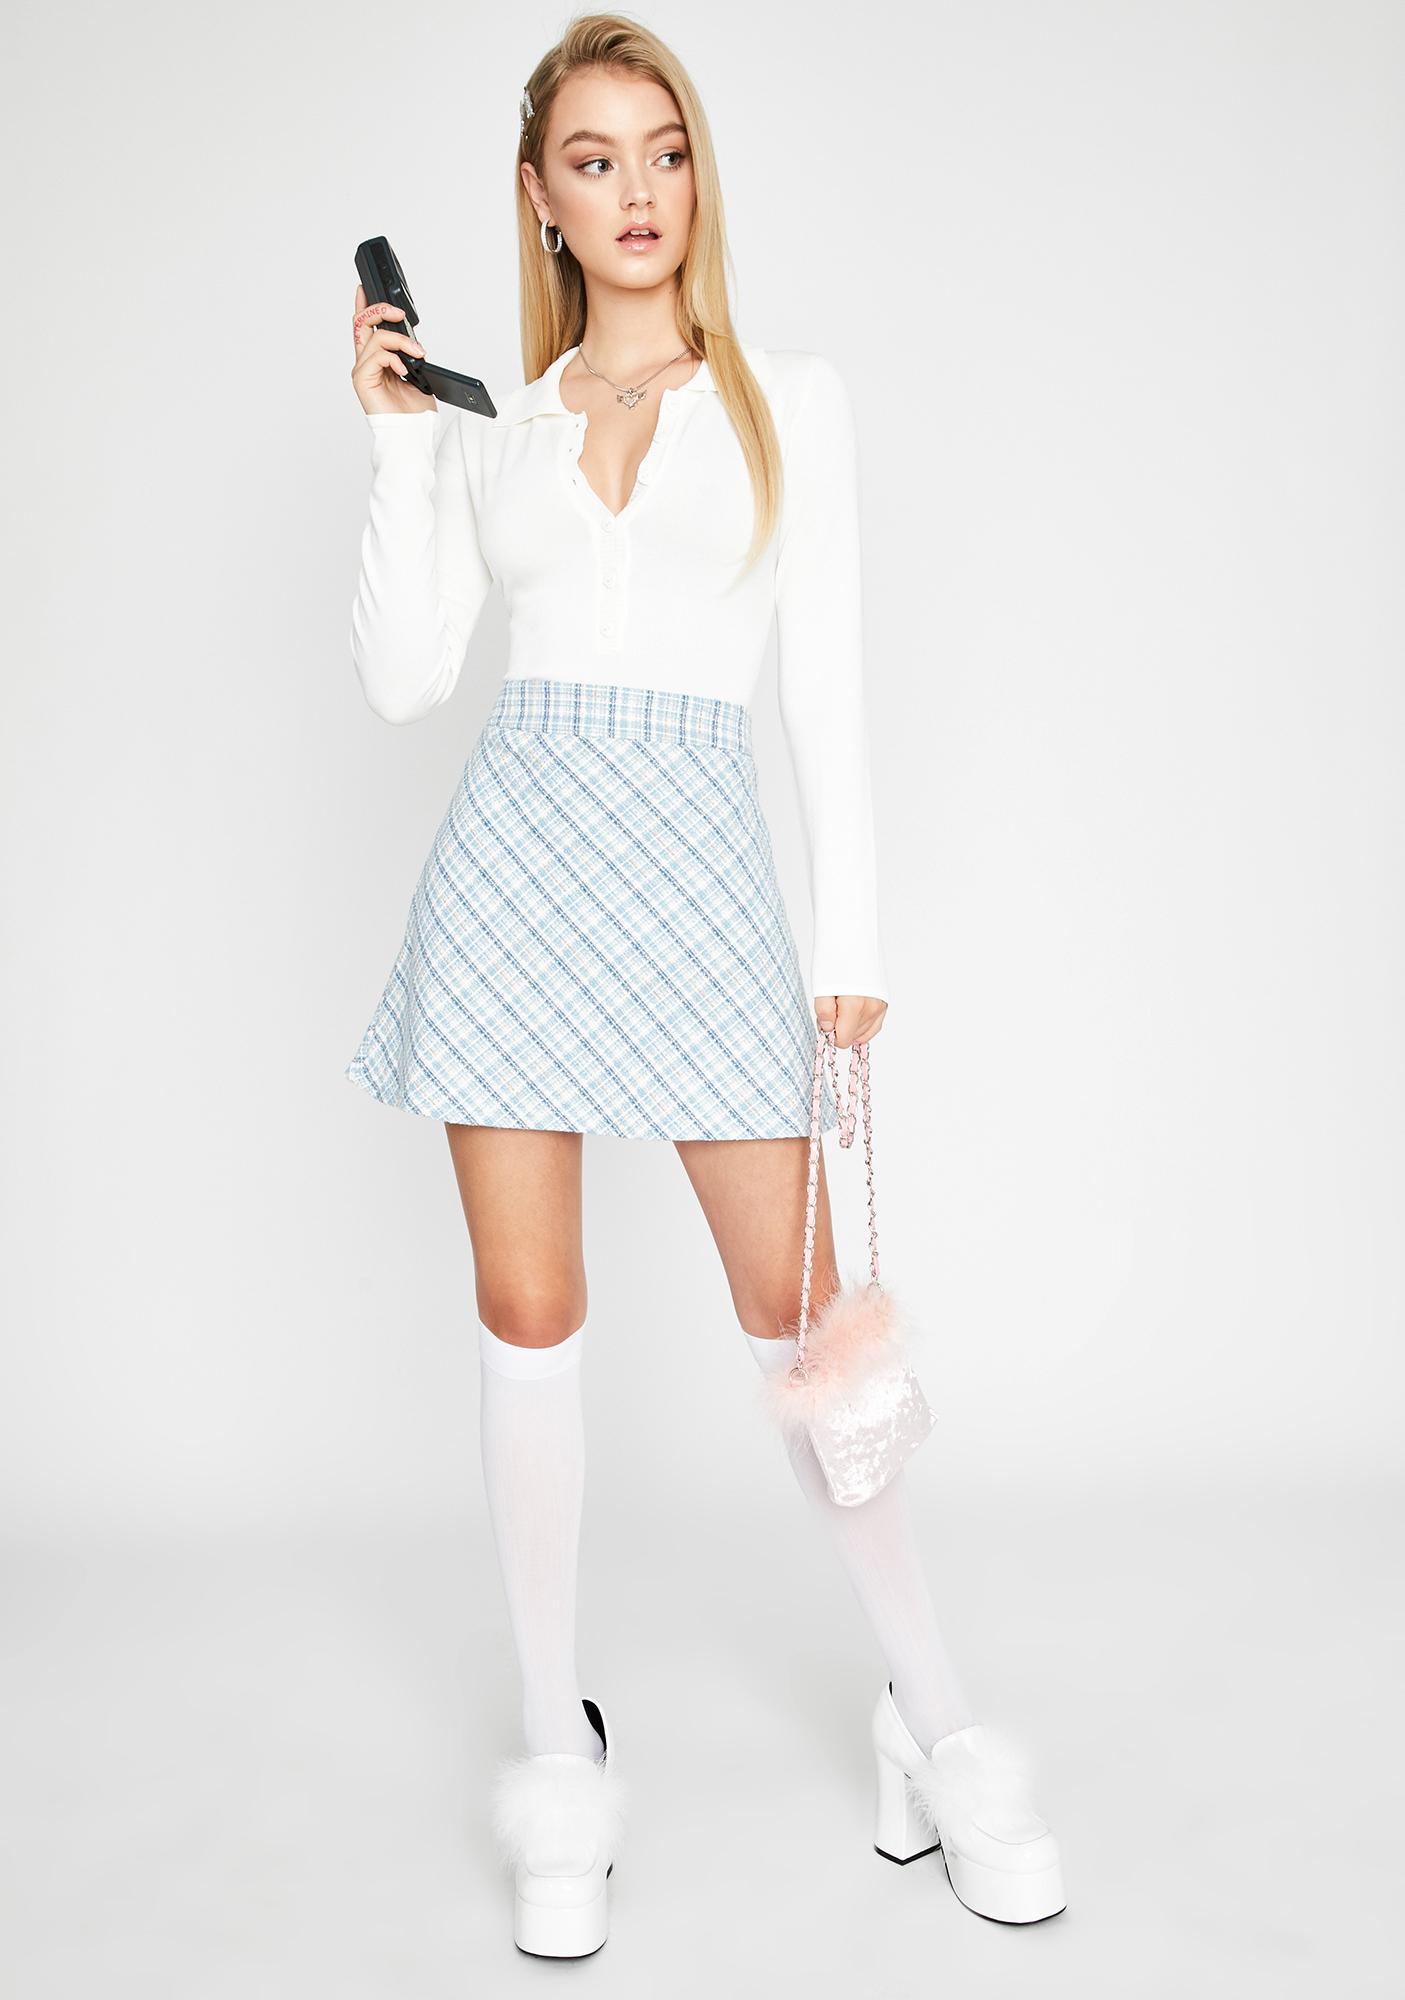 Sugar Thrillz What's The Latest Knit Bodysuit